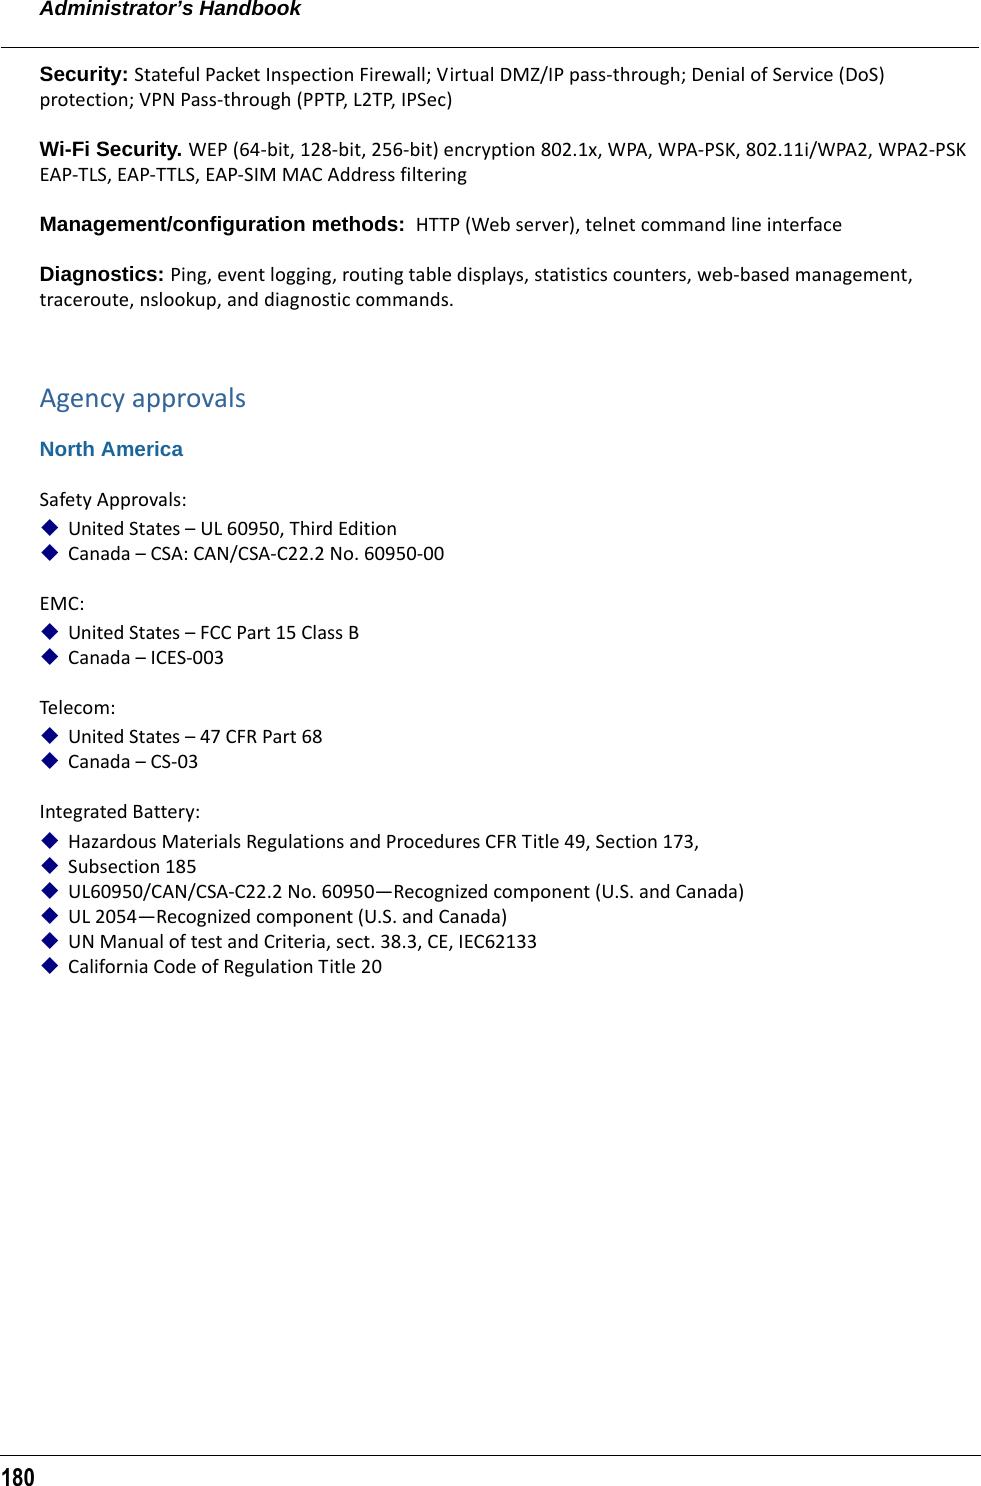 ARRIS NVG599 DSL User Manual Part 2